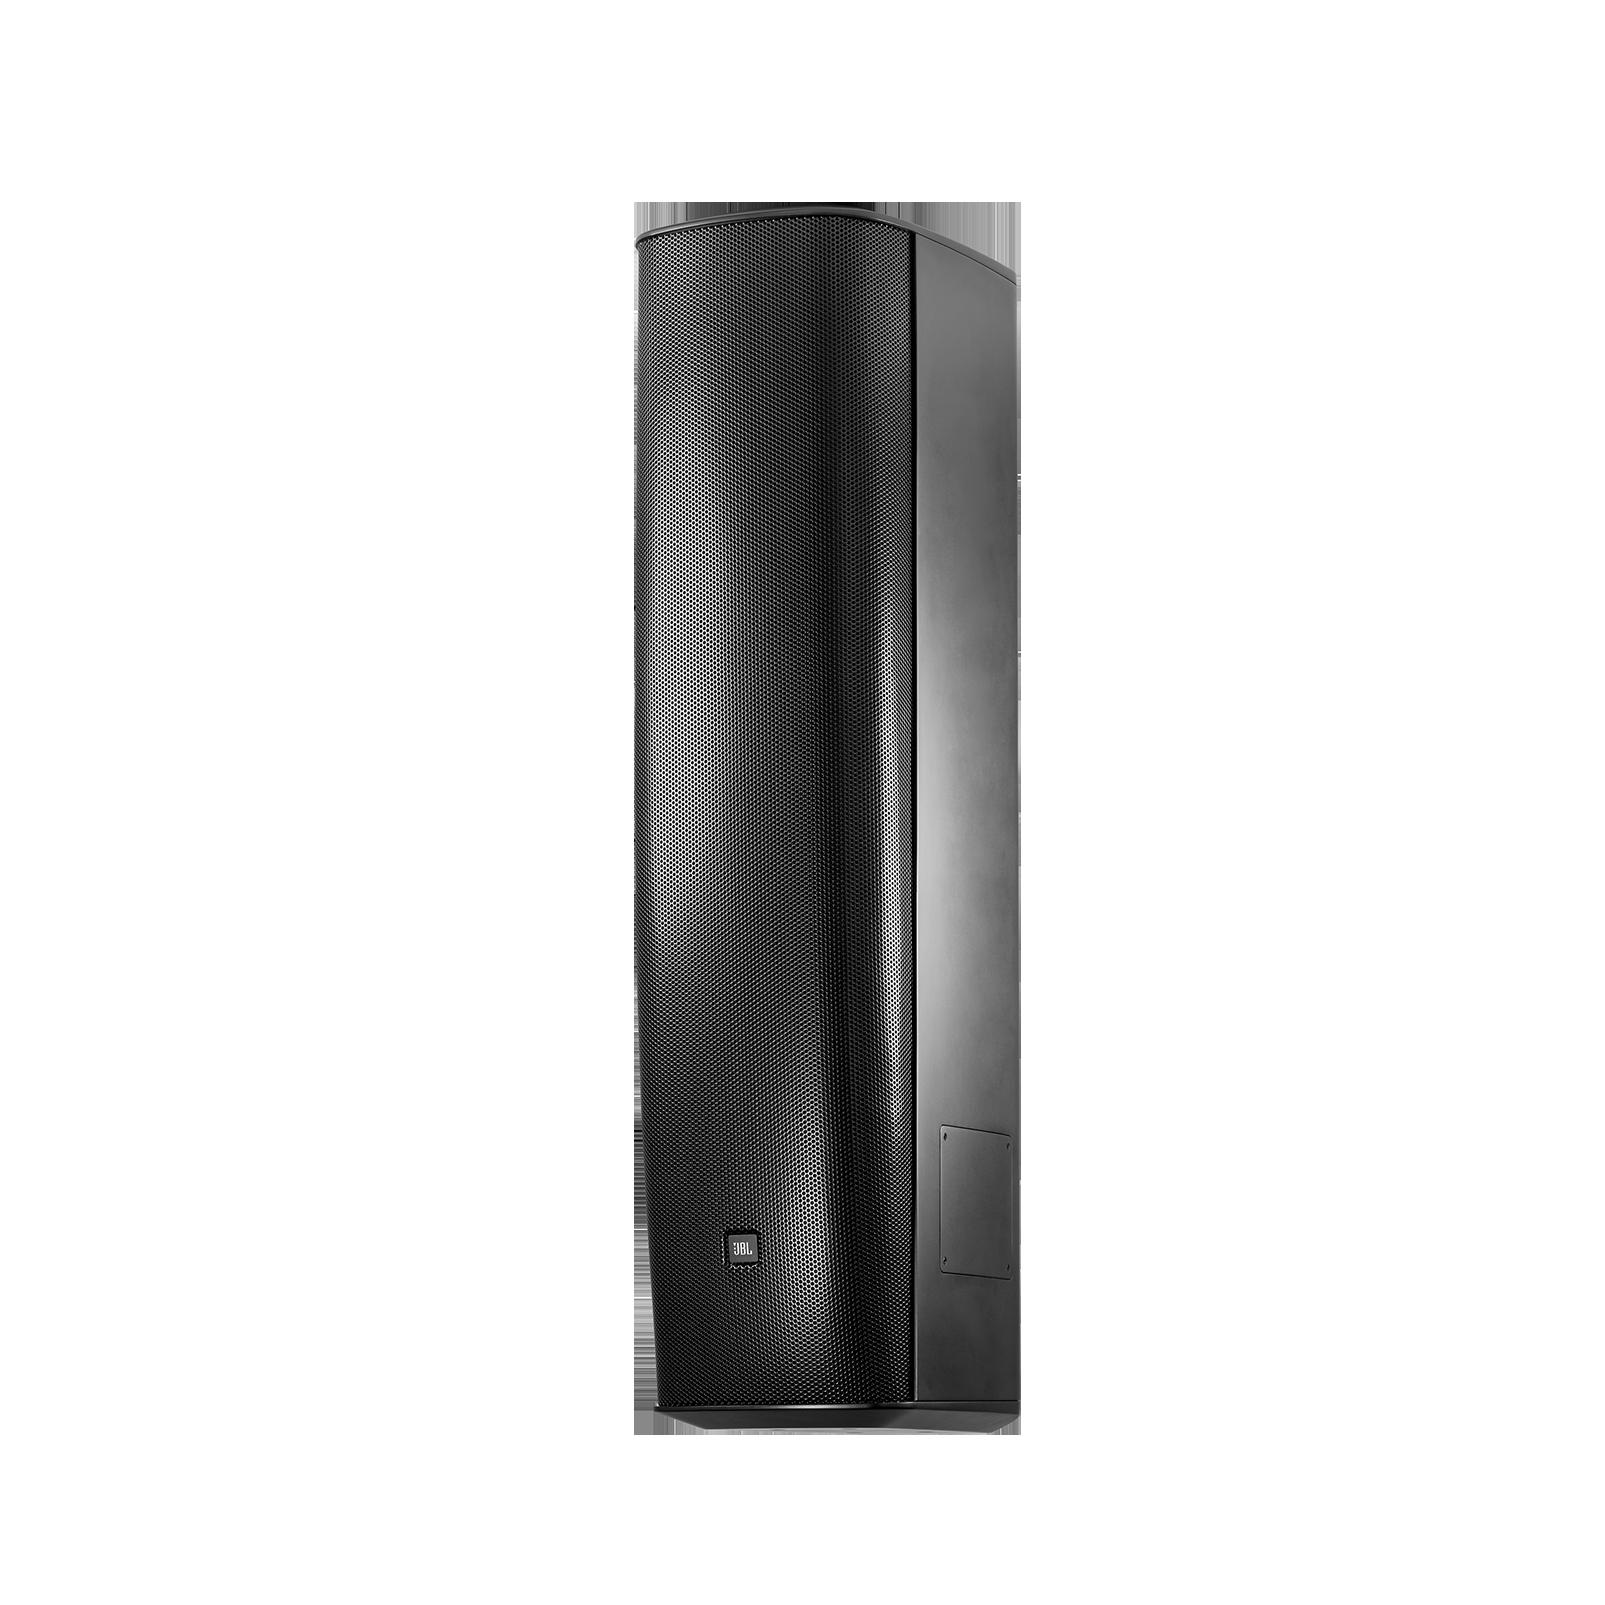 JBL CBT 1000 (B-Stock) - Black - Constant Beamwidth Technology ™ Adjustable Coverage Line Array Column - Hero